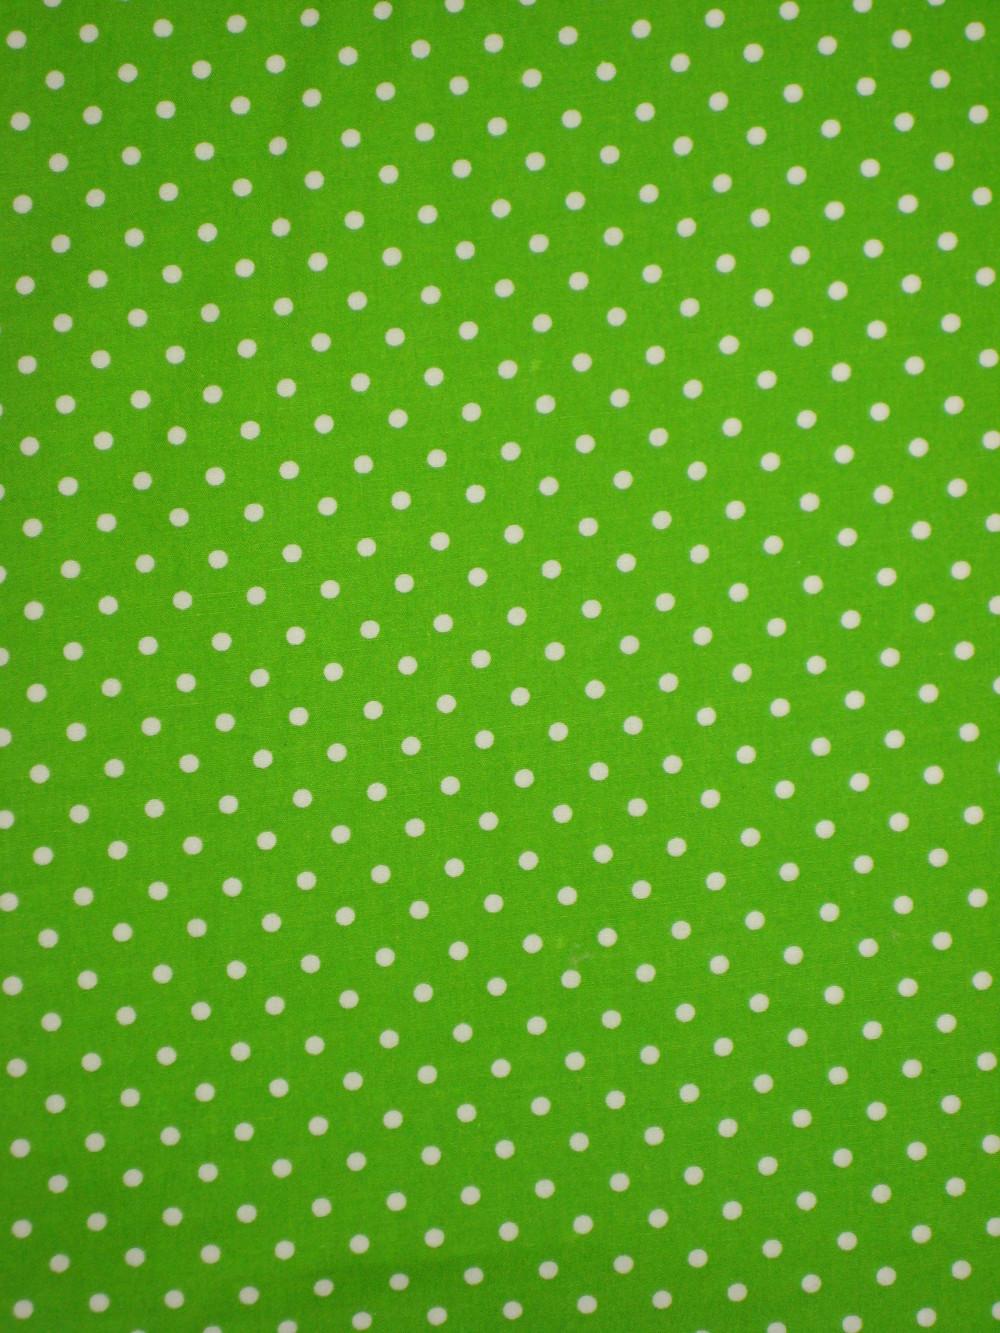 Green with White Polka Dots.jpg